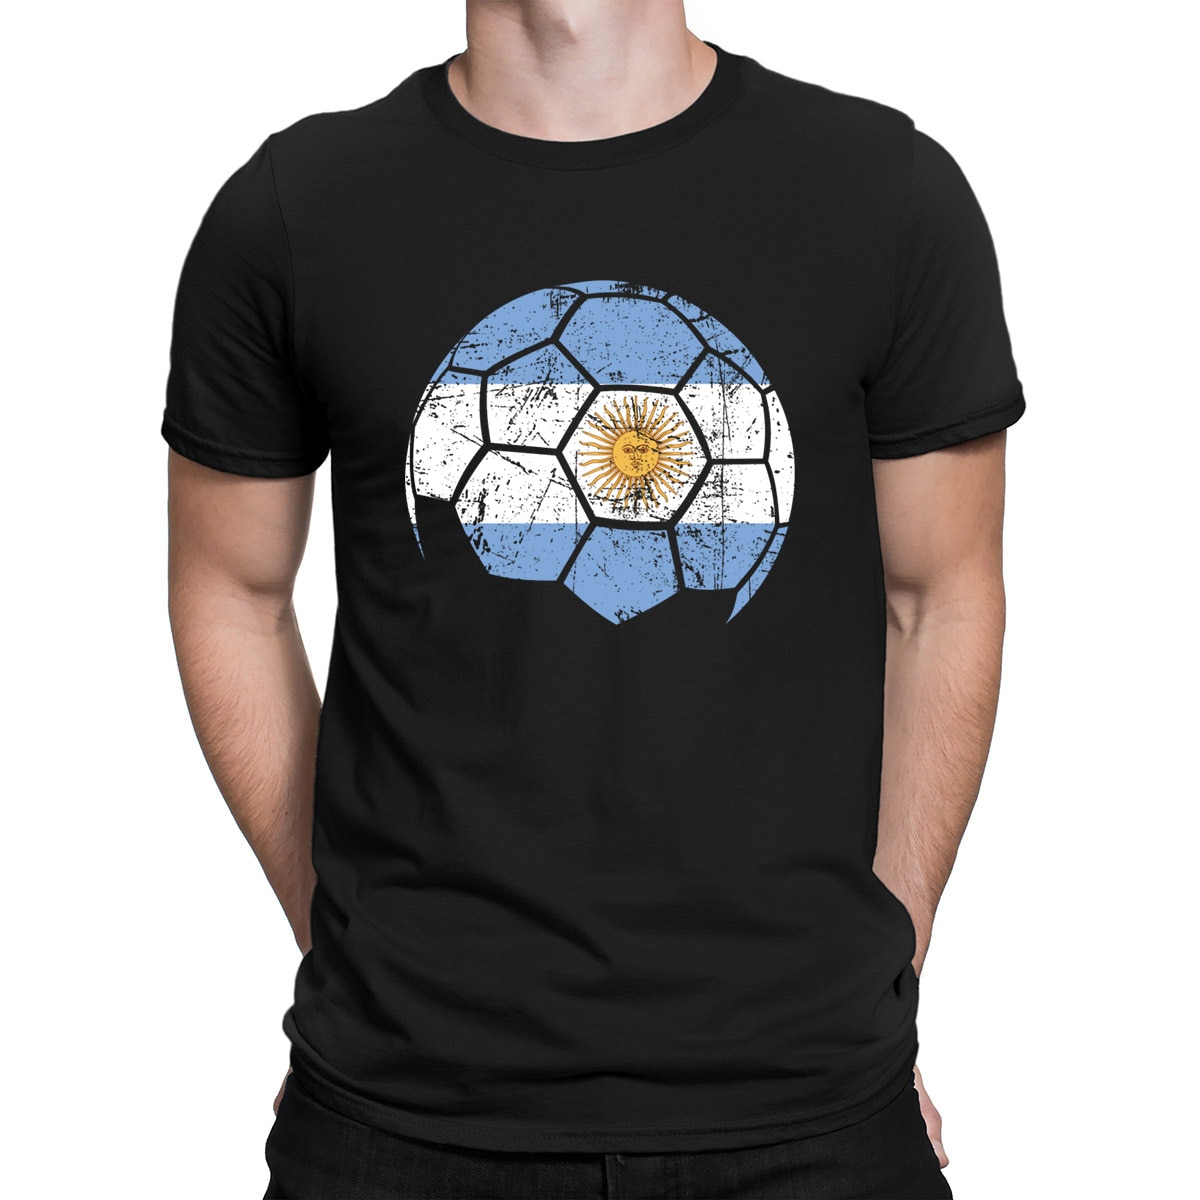 Argentina soccer fútbol camiseta verano inteligente de alta calidad de manga corta Camiseta para hombre diseño Pop camiseta superior